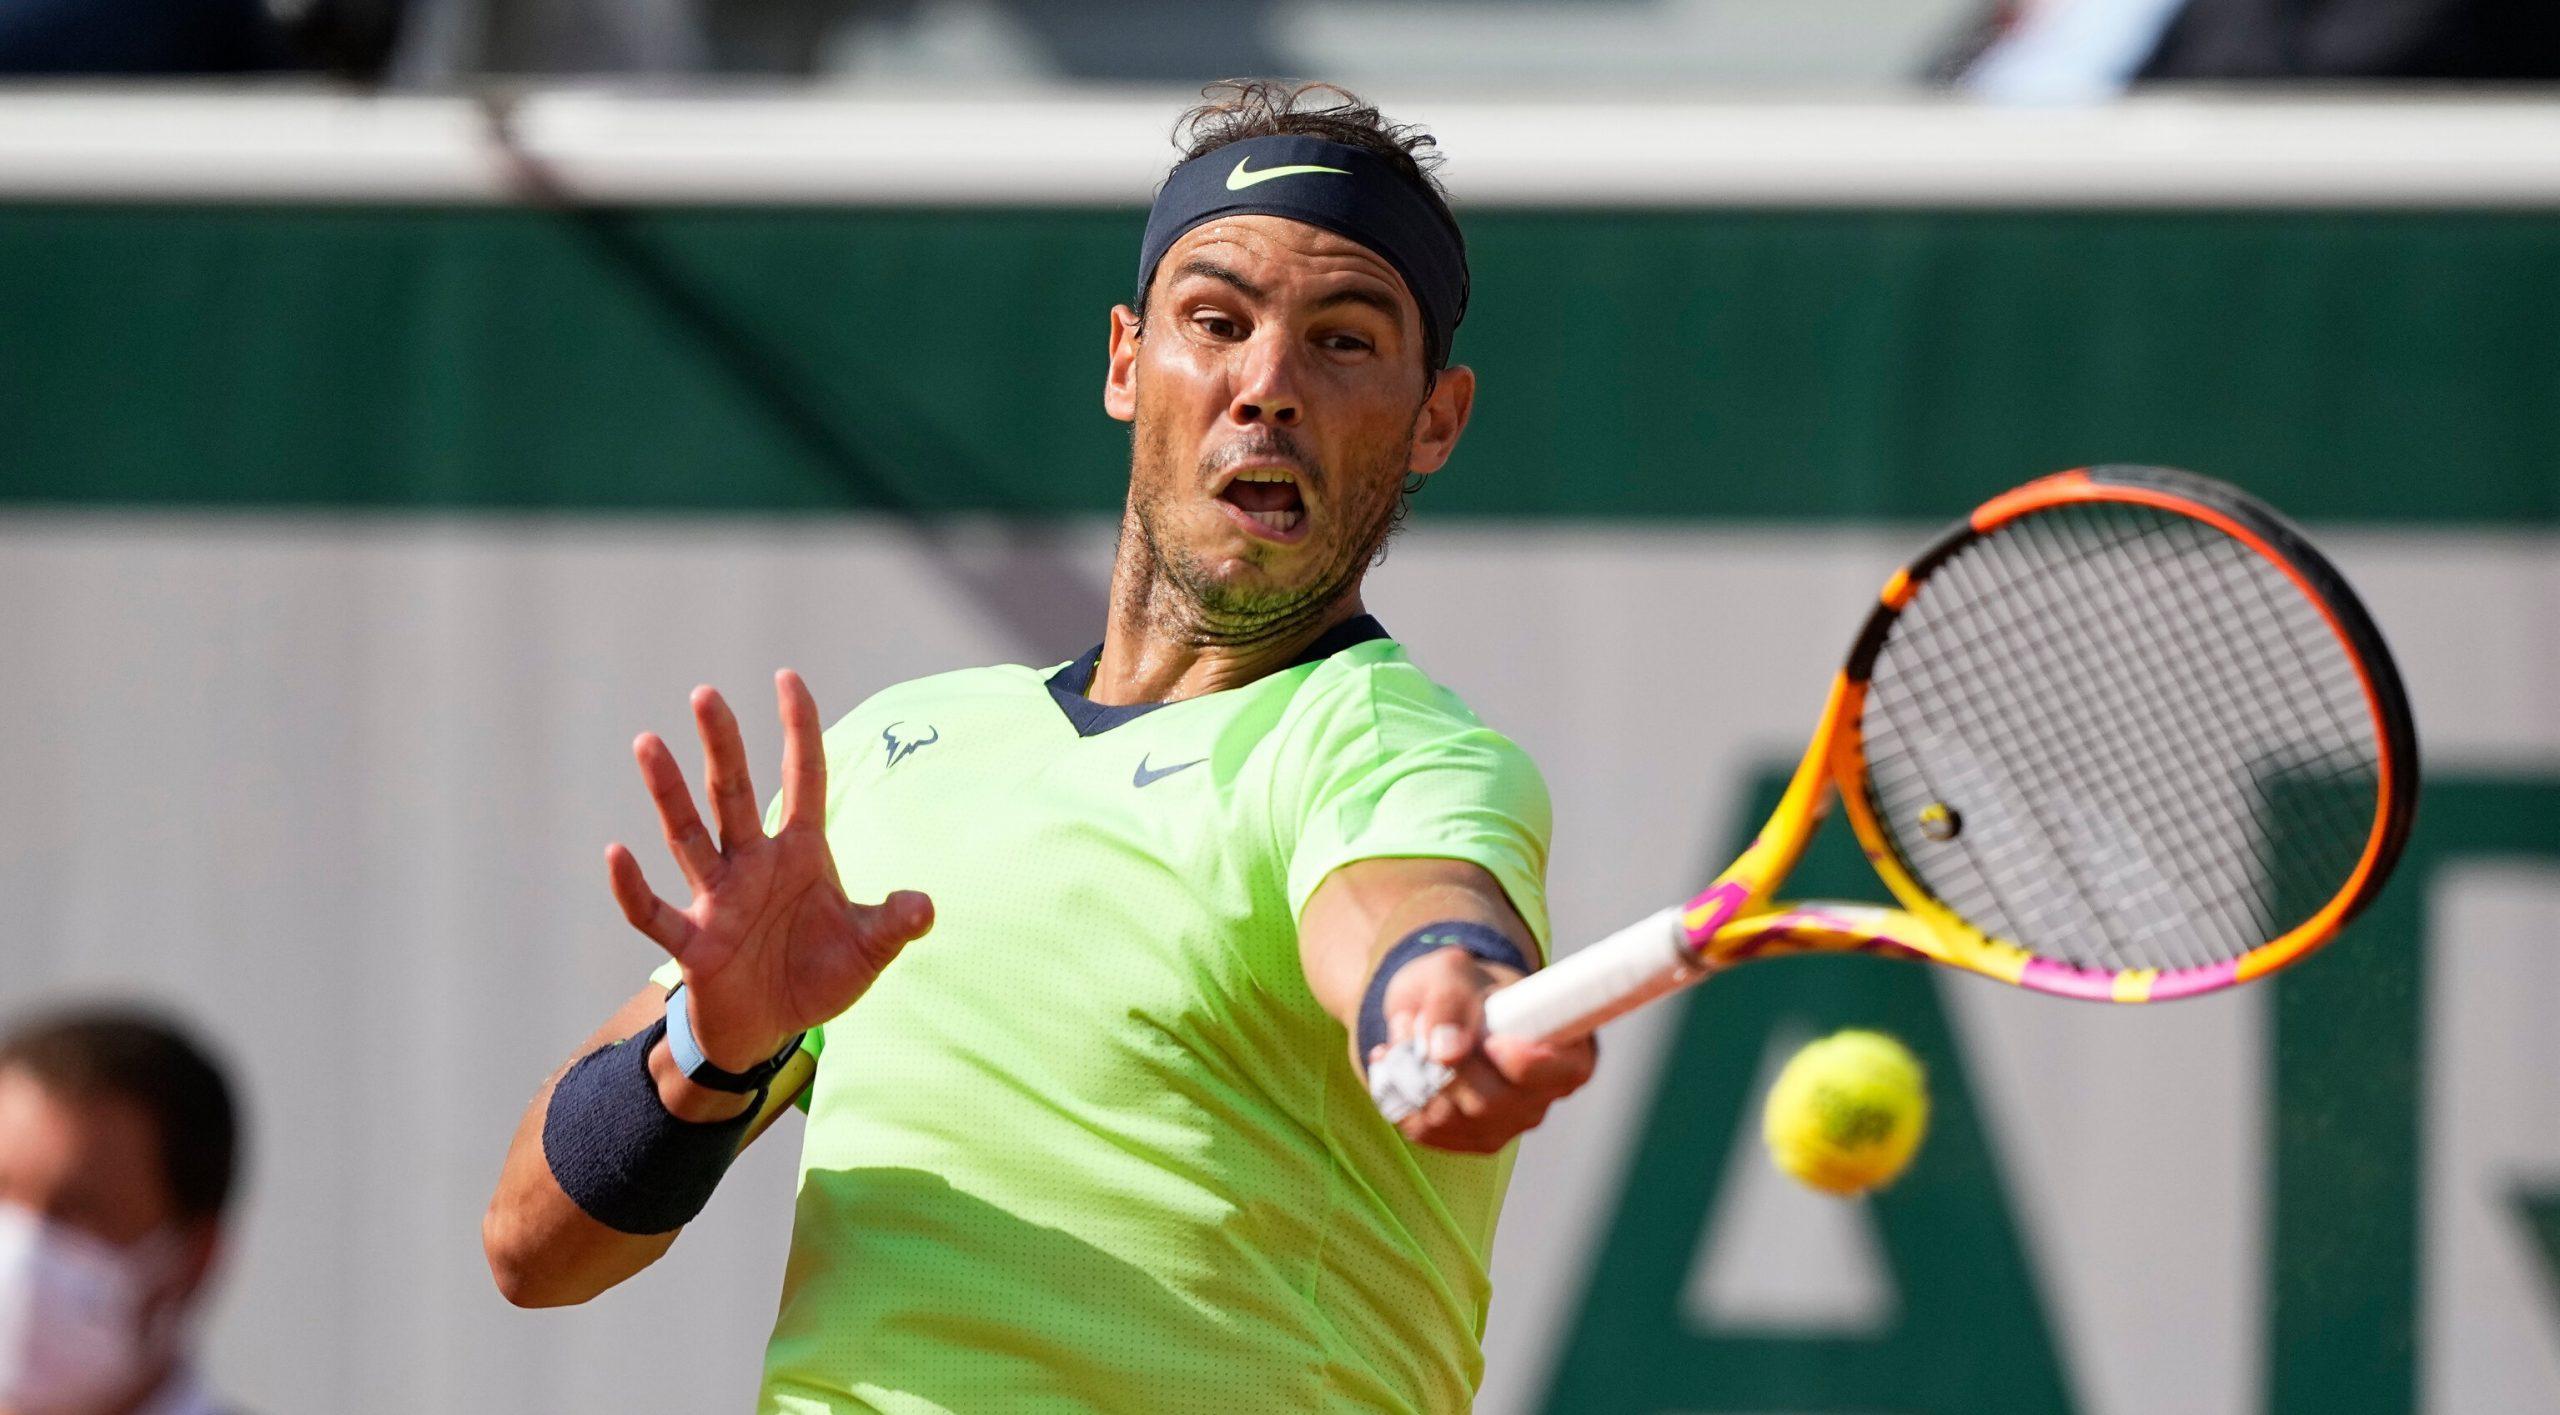 Rafael Nadal se retrage de la Wimbledon și de la Jocurile Olimpice de la Tokyo